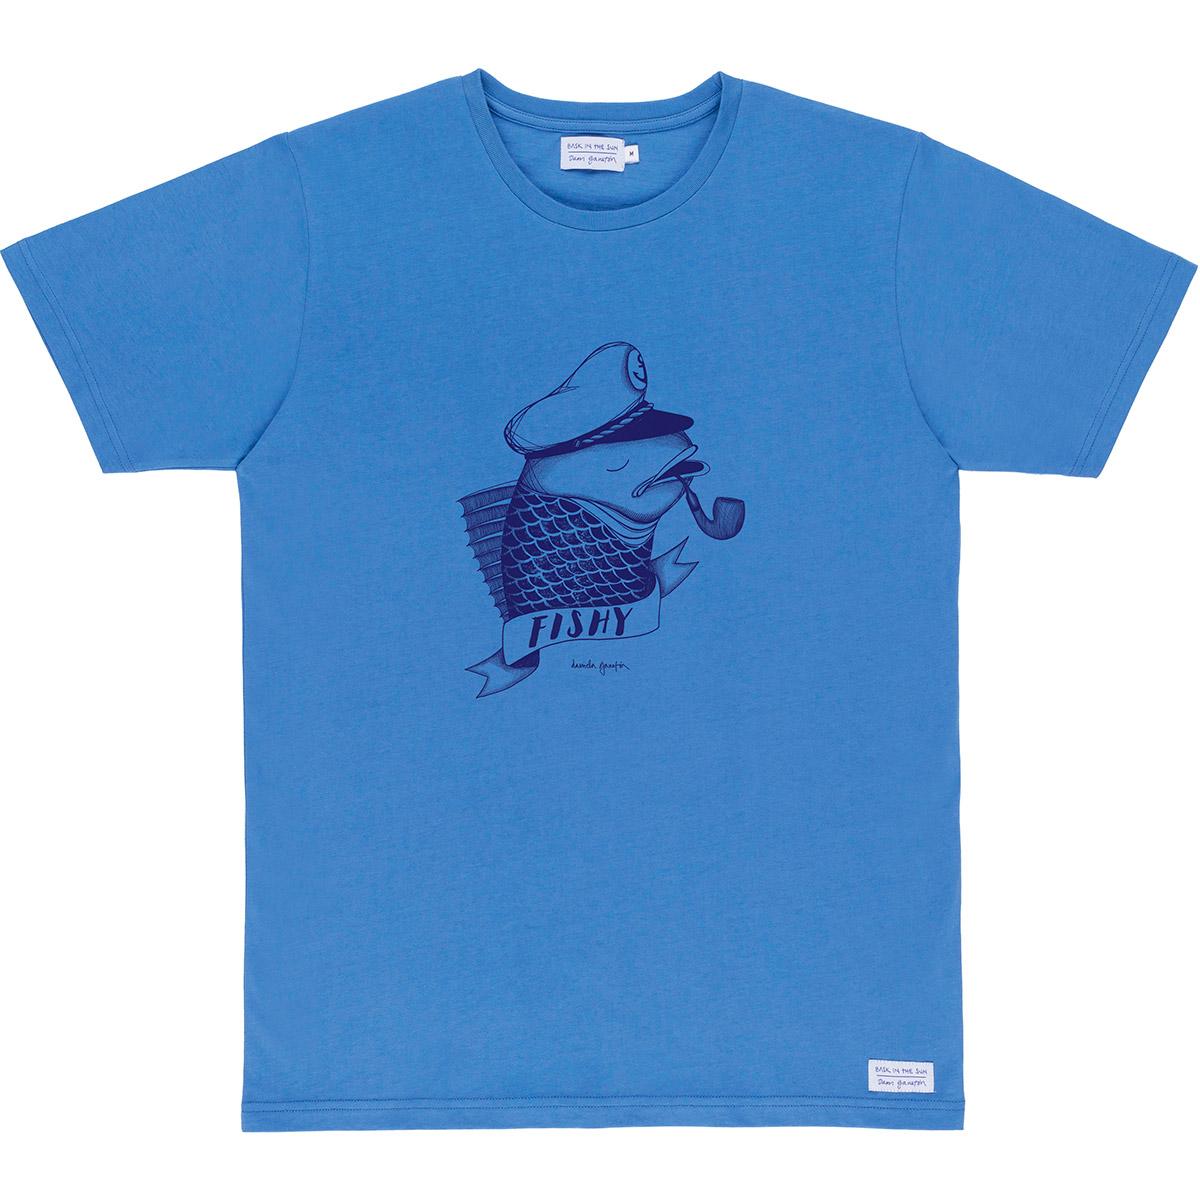 Bask in the Sun - Blue fishy tee